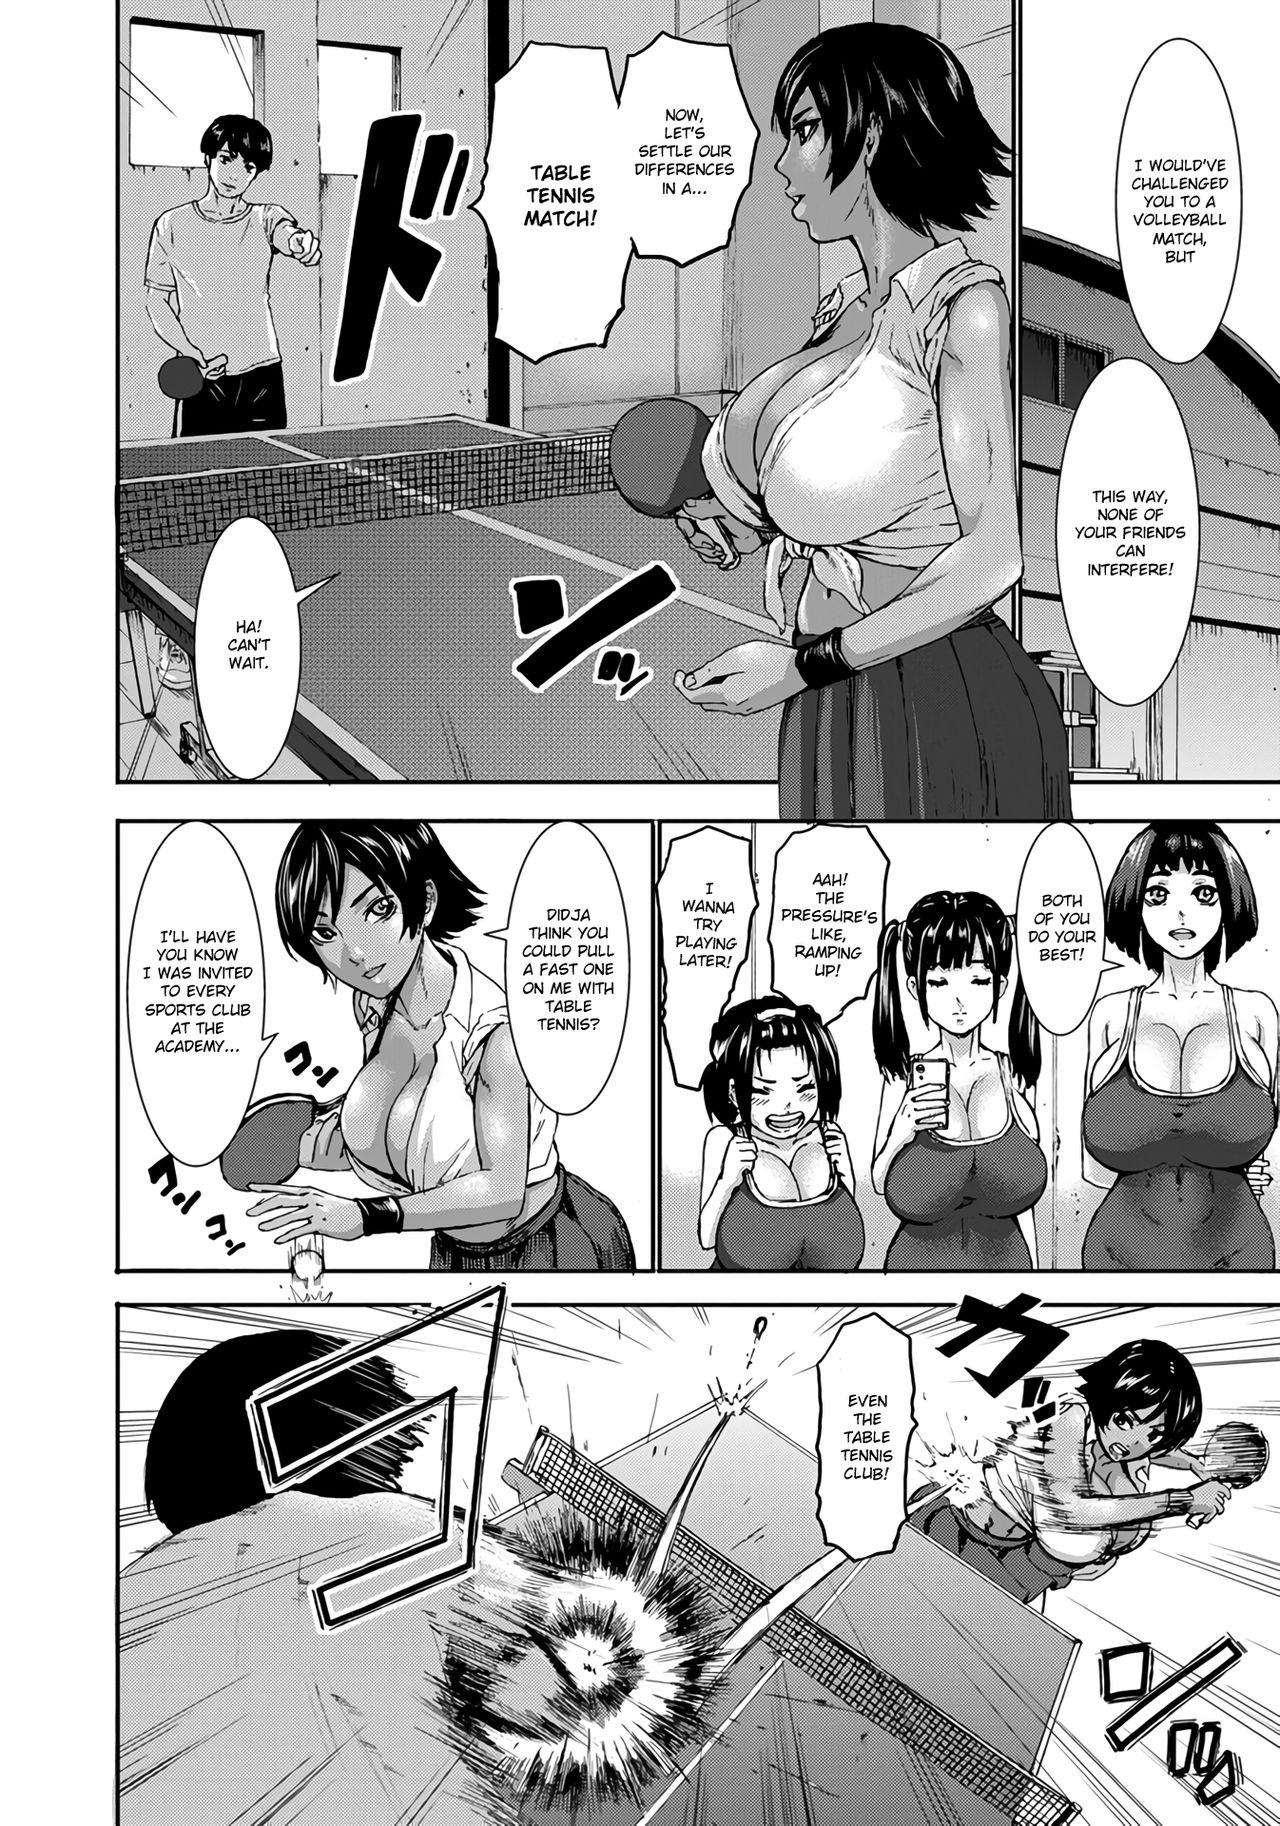 Chounyuu Gakuen | Academy For Huge Breasts Ch. 1-3 29